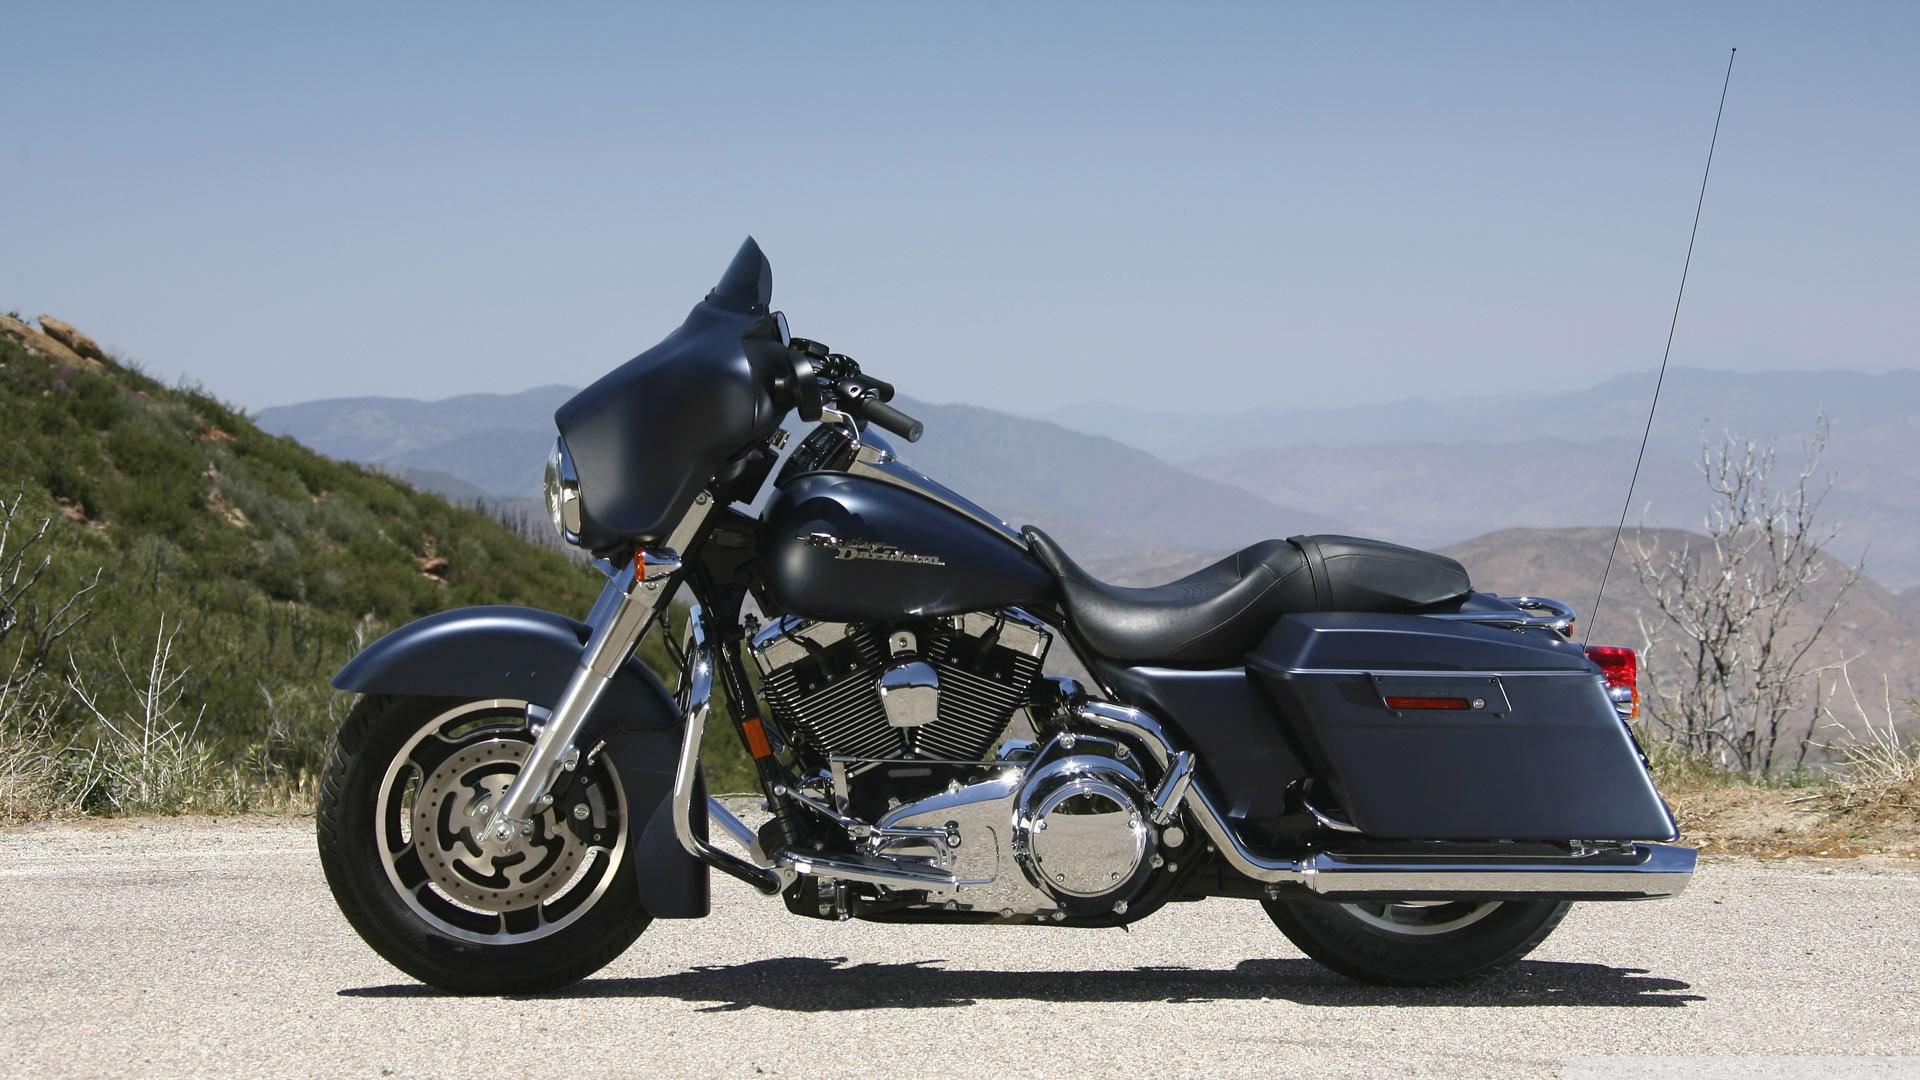 bike latest wallpaper motorcycles bikes davidson harley 1920x1080